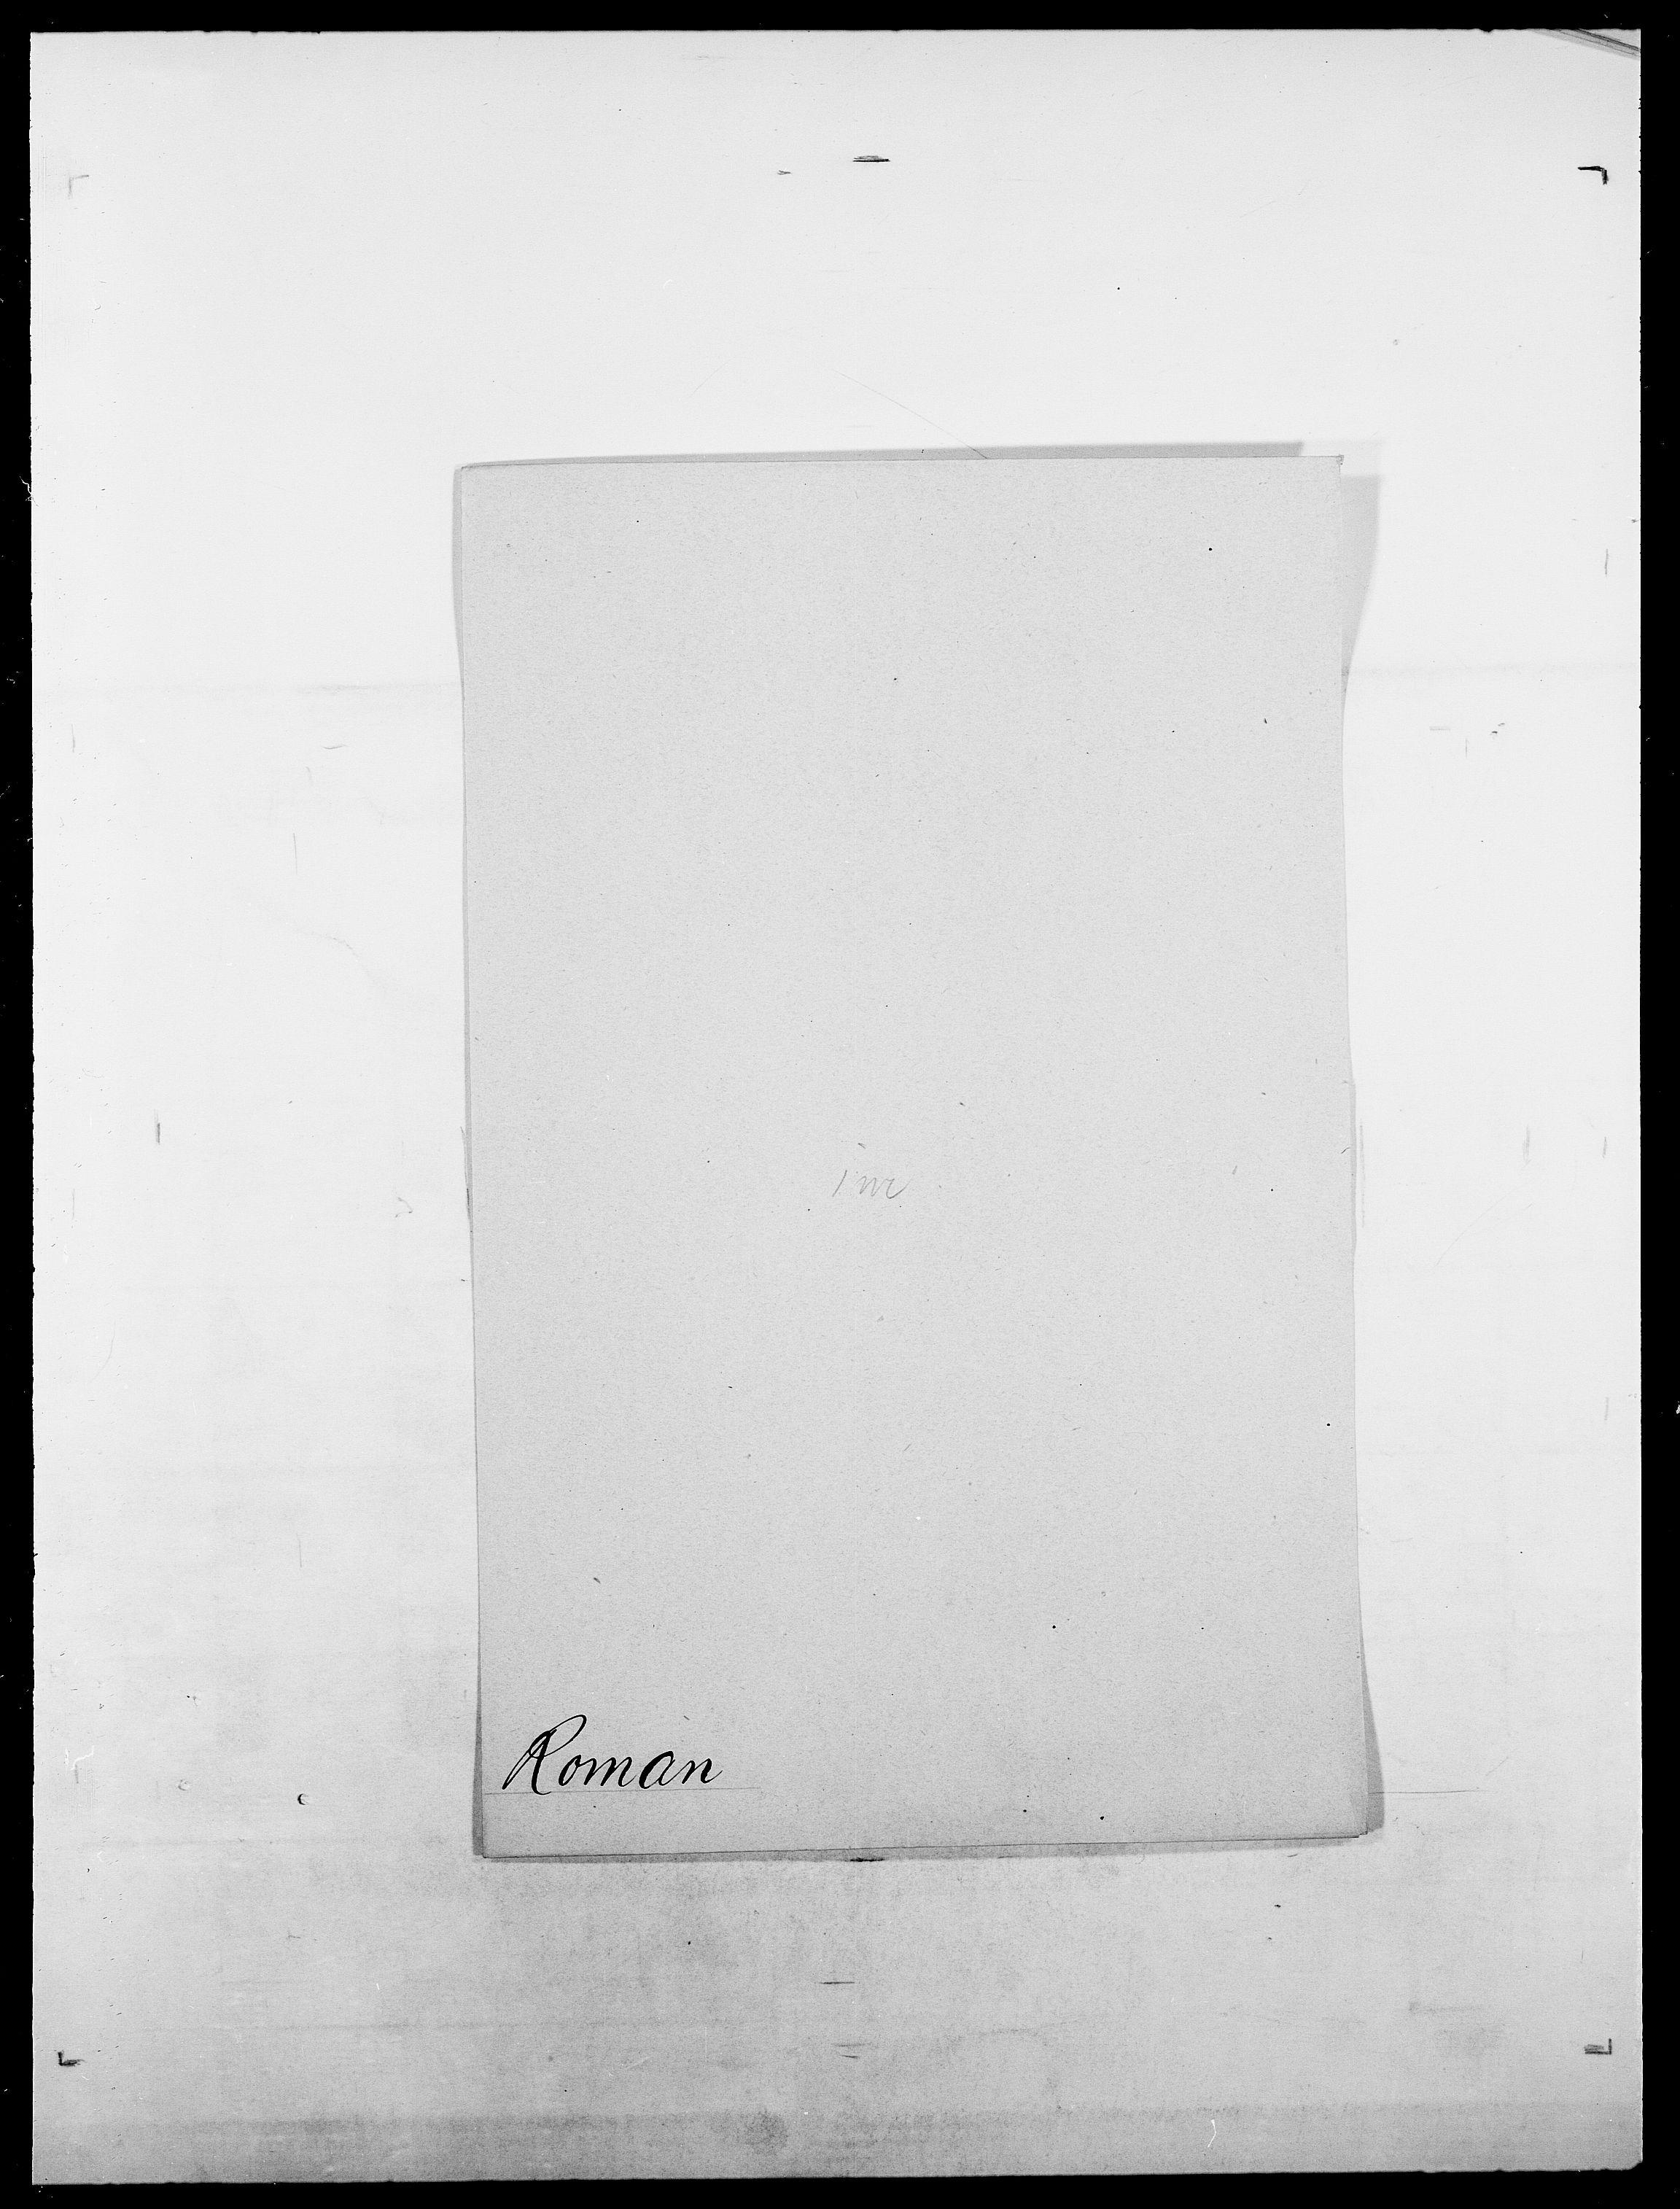 SAO, Delgobe, Charles Antoine - samling, D/Da/L0033: Roald - Røyem, s. 163